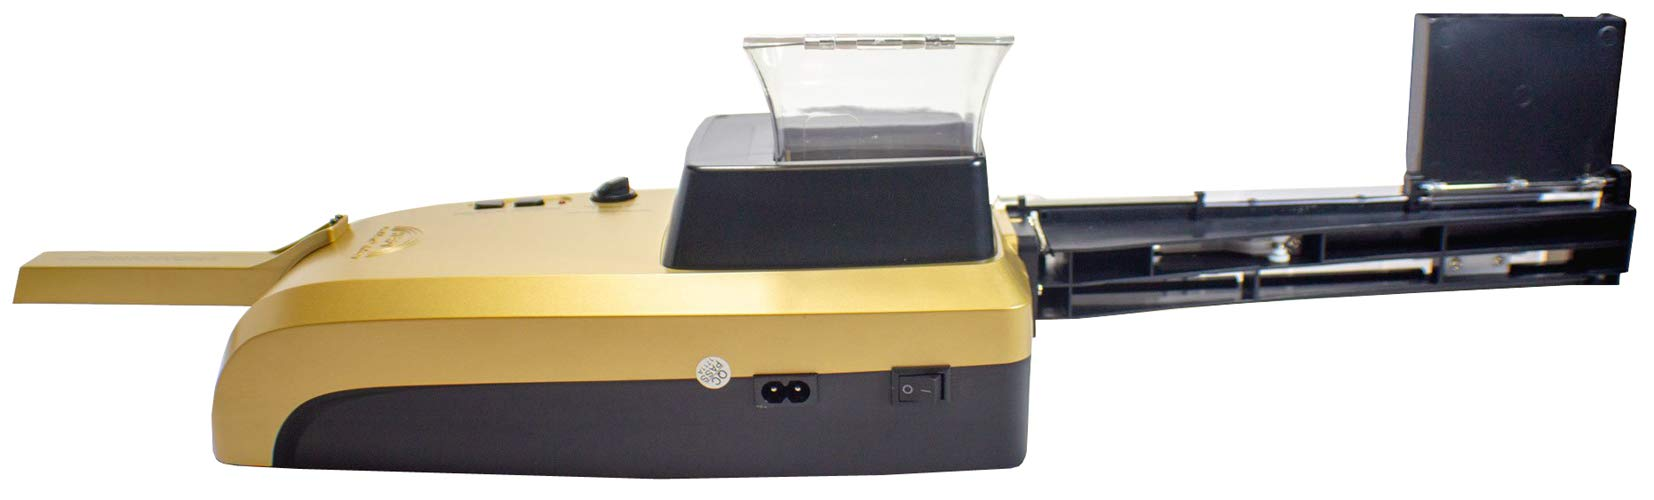 HSPT Automatic Golden Rainbow 10.3U Electric Cigarette Making Machine by HSPT (Image #3)